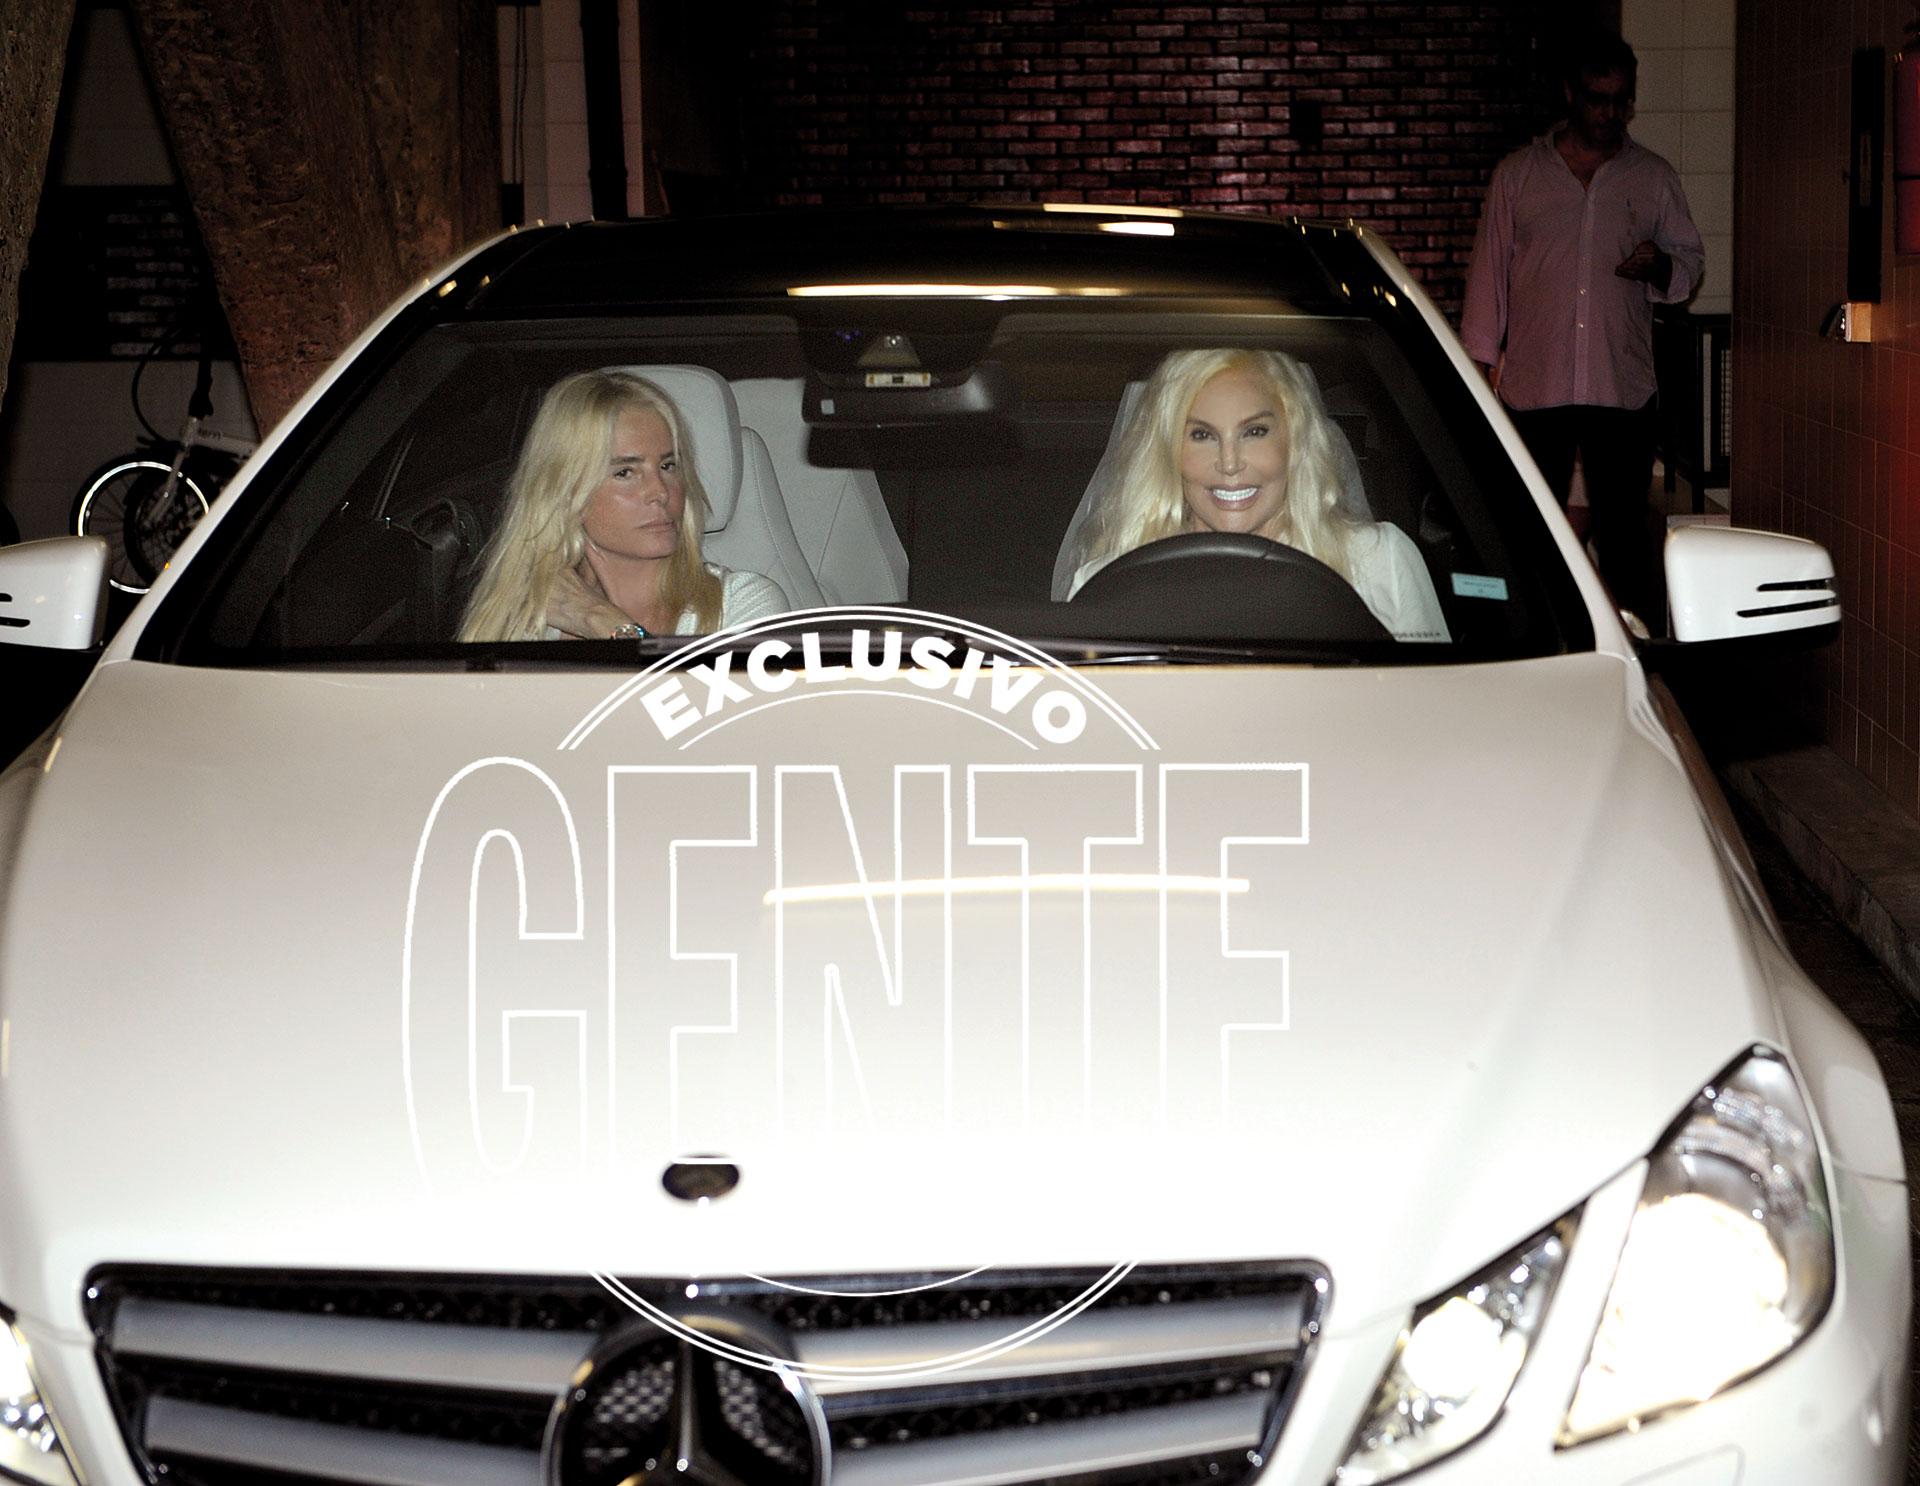 Susana llegó al volante de su Mercedes Benz, junto a su hija Mecha Sarrabayrouse.